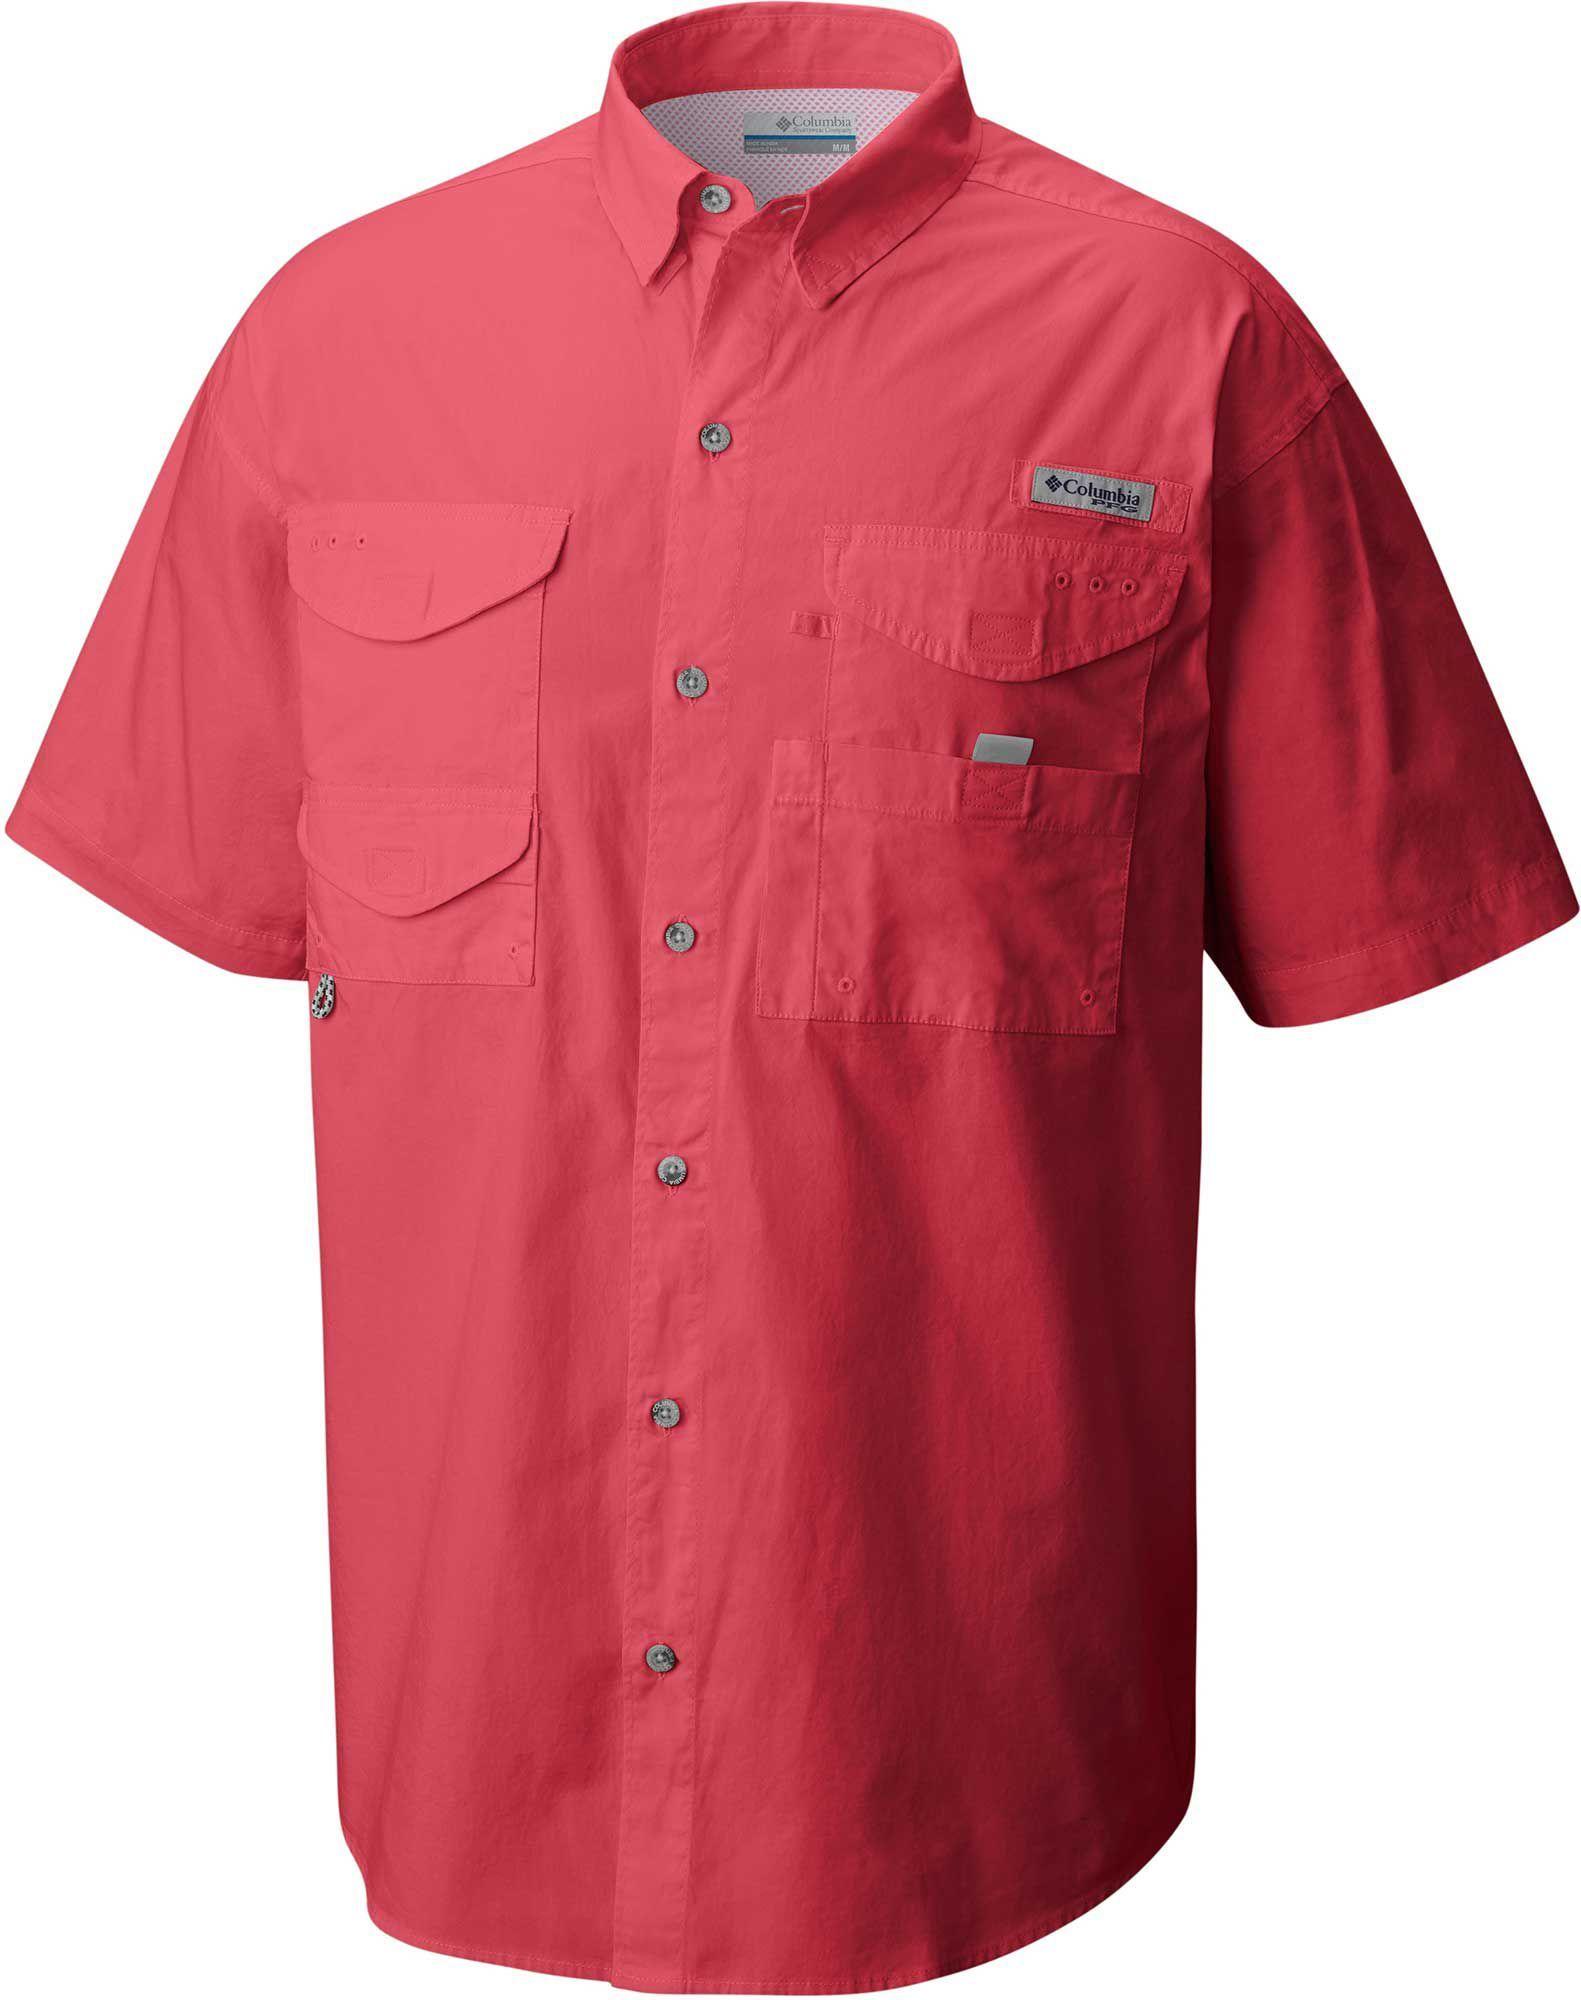 25fc736a6a7 Columbia Men's PFG Bonehead Short Sleeve Shirt, Size: Small, Black ...